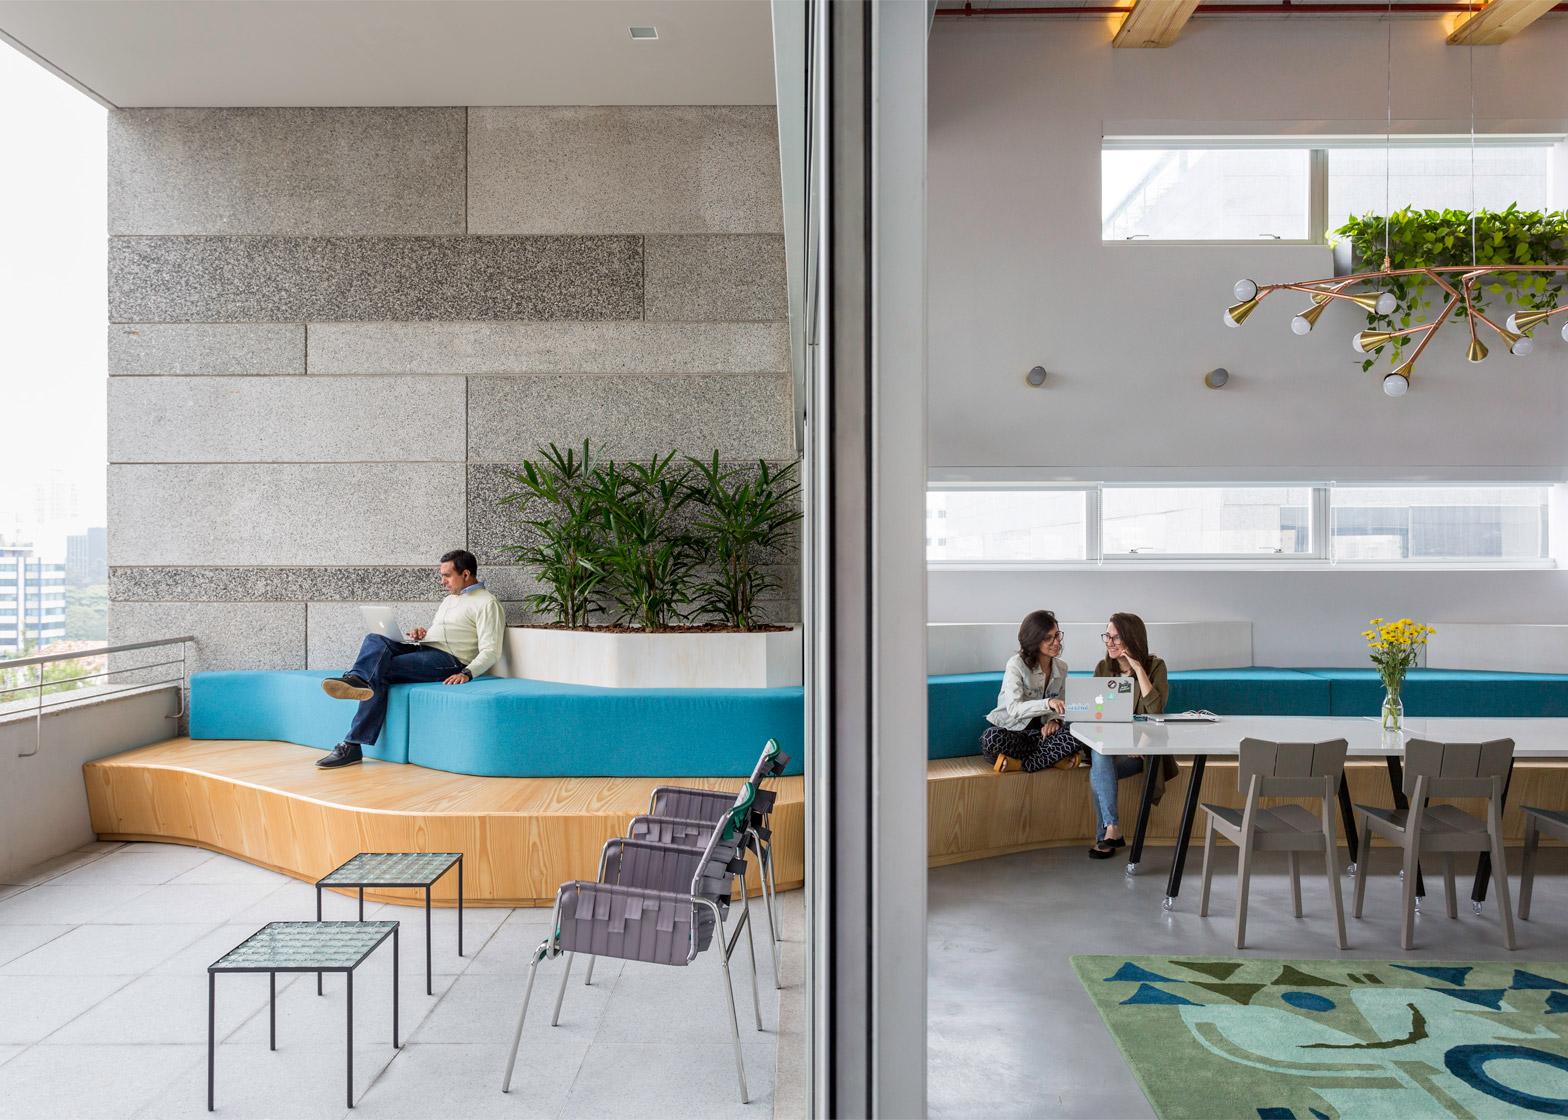 airbnb-offices_sao-paulo_mm18_dezeen_1568_5